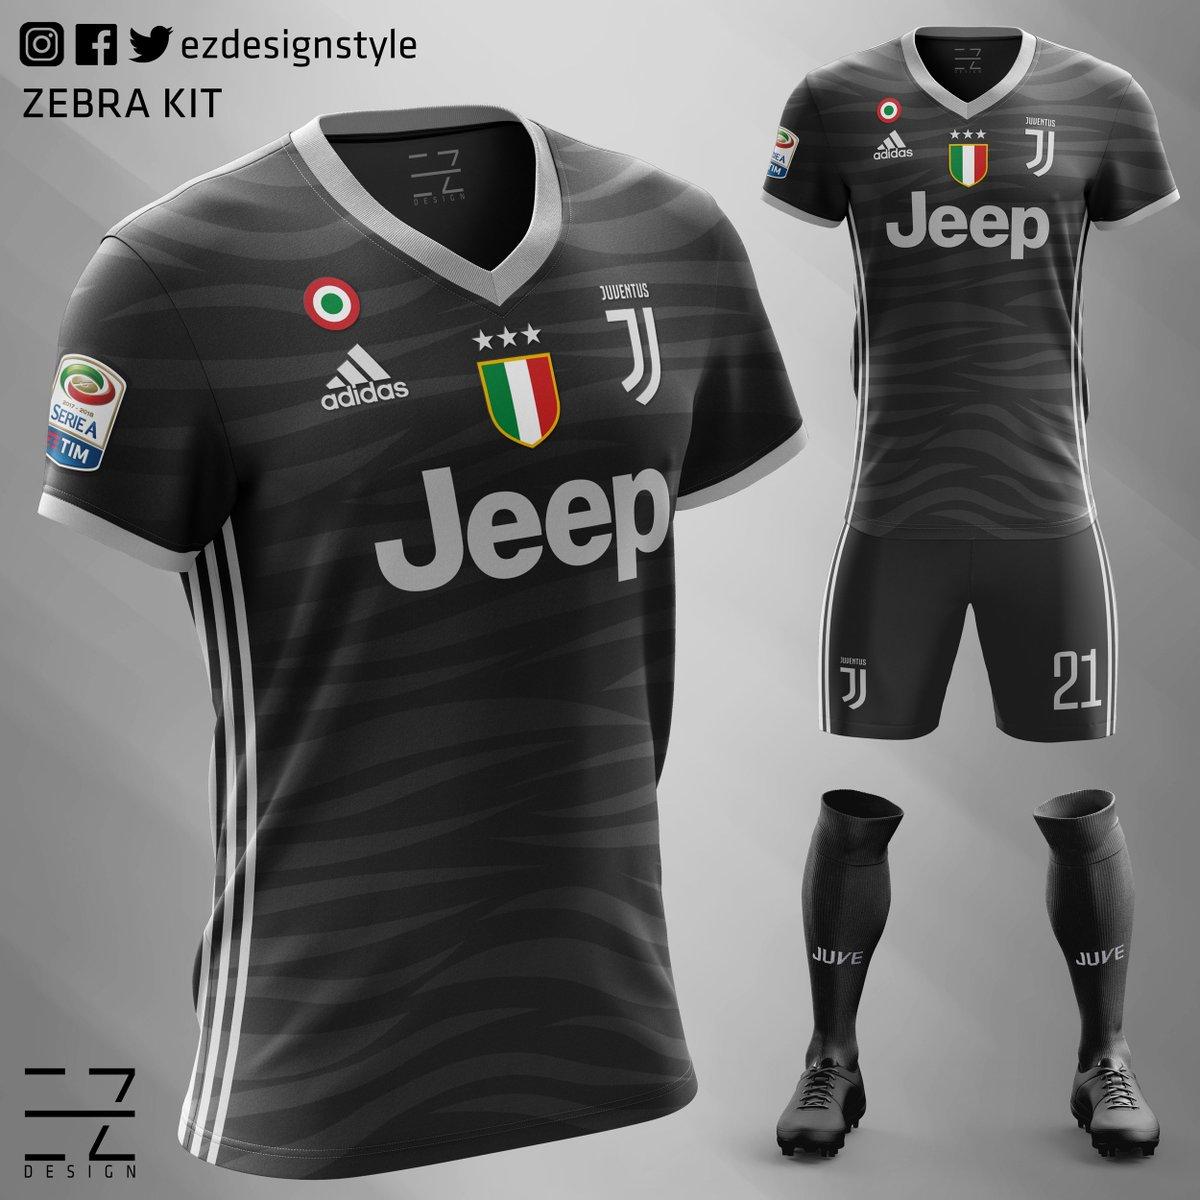 Ezeta On Twitter Zebra Kit Juventus Juventusfc Juve Jeep Adidasfootball Bianconeri Storiadiungrandeamore Juve120 Dybala Dybalamask Juvescp Https T Co Dwkcaed9as